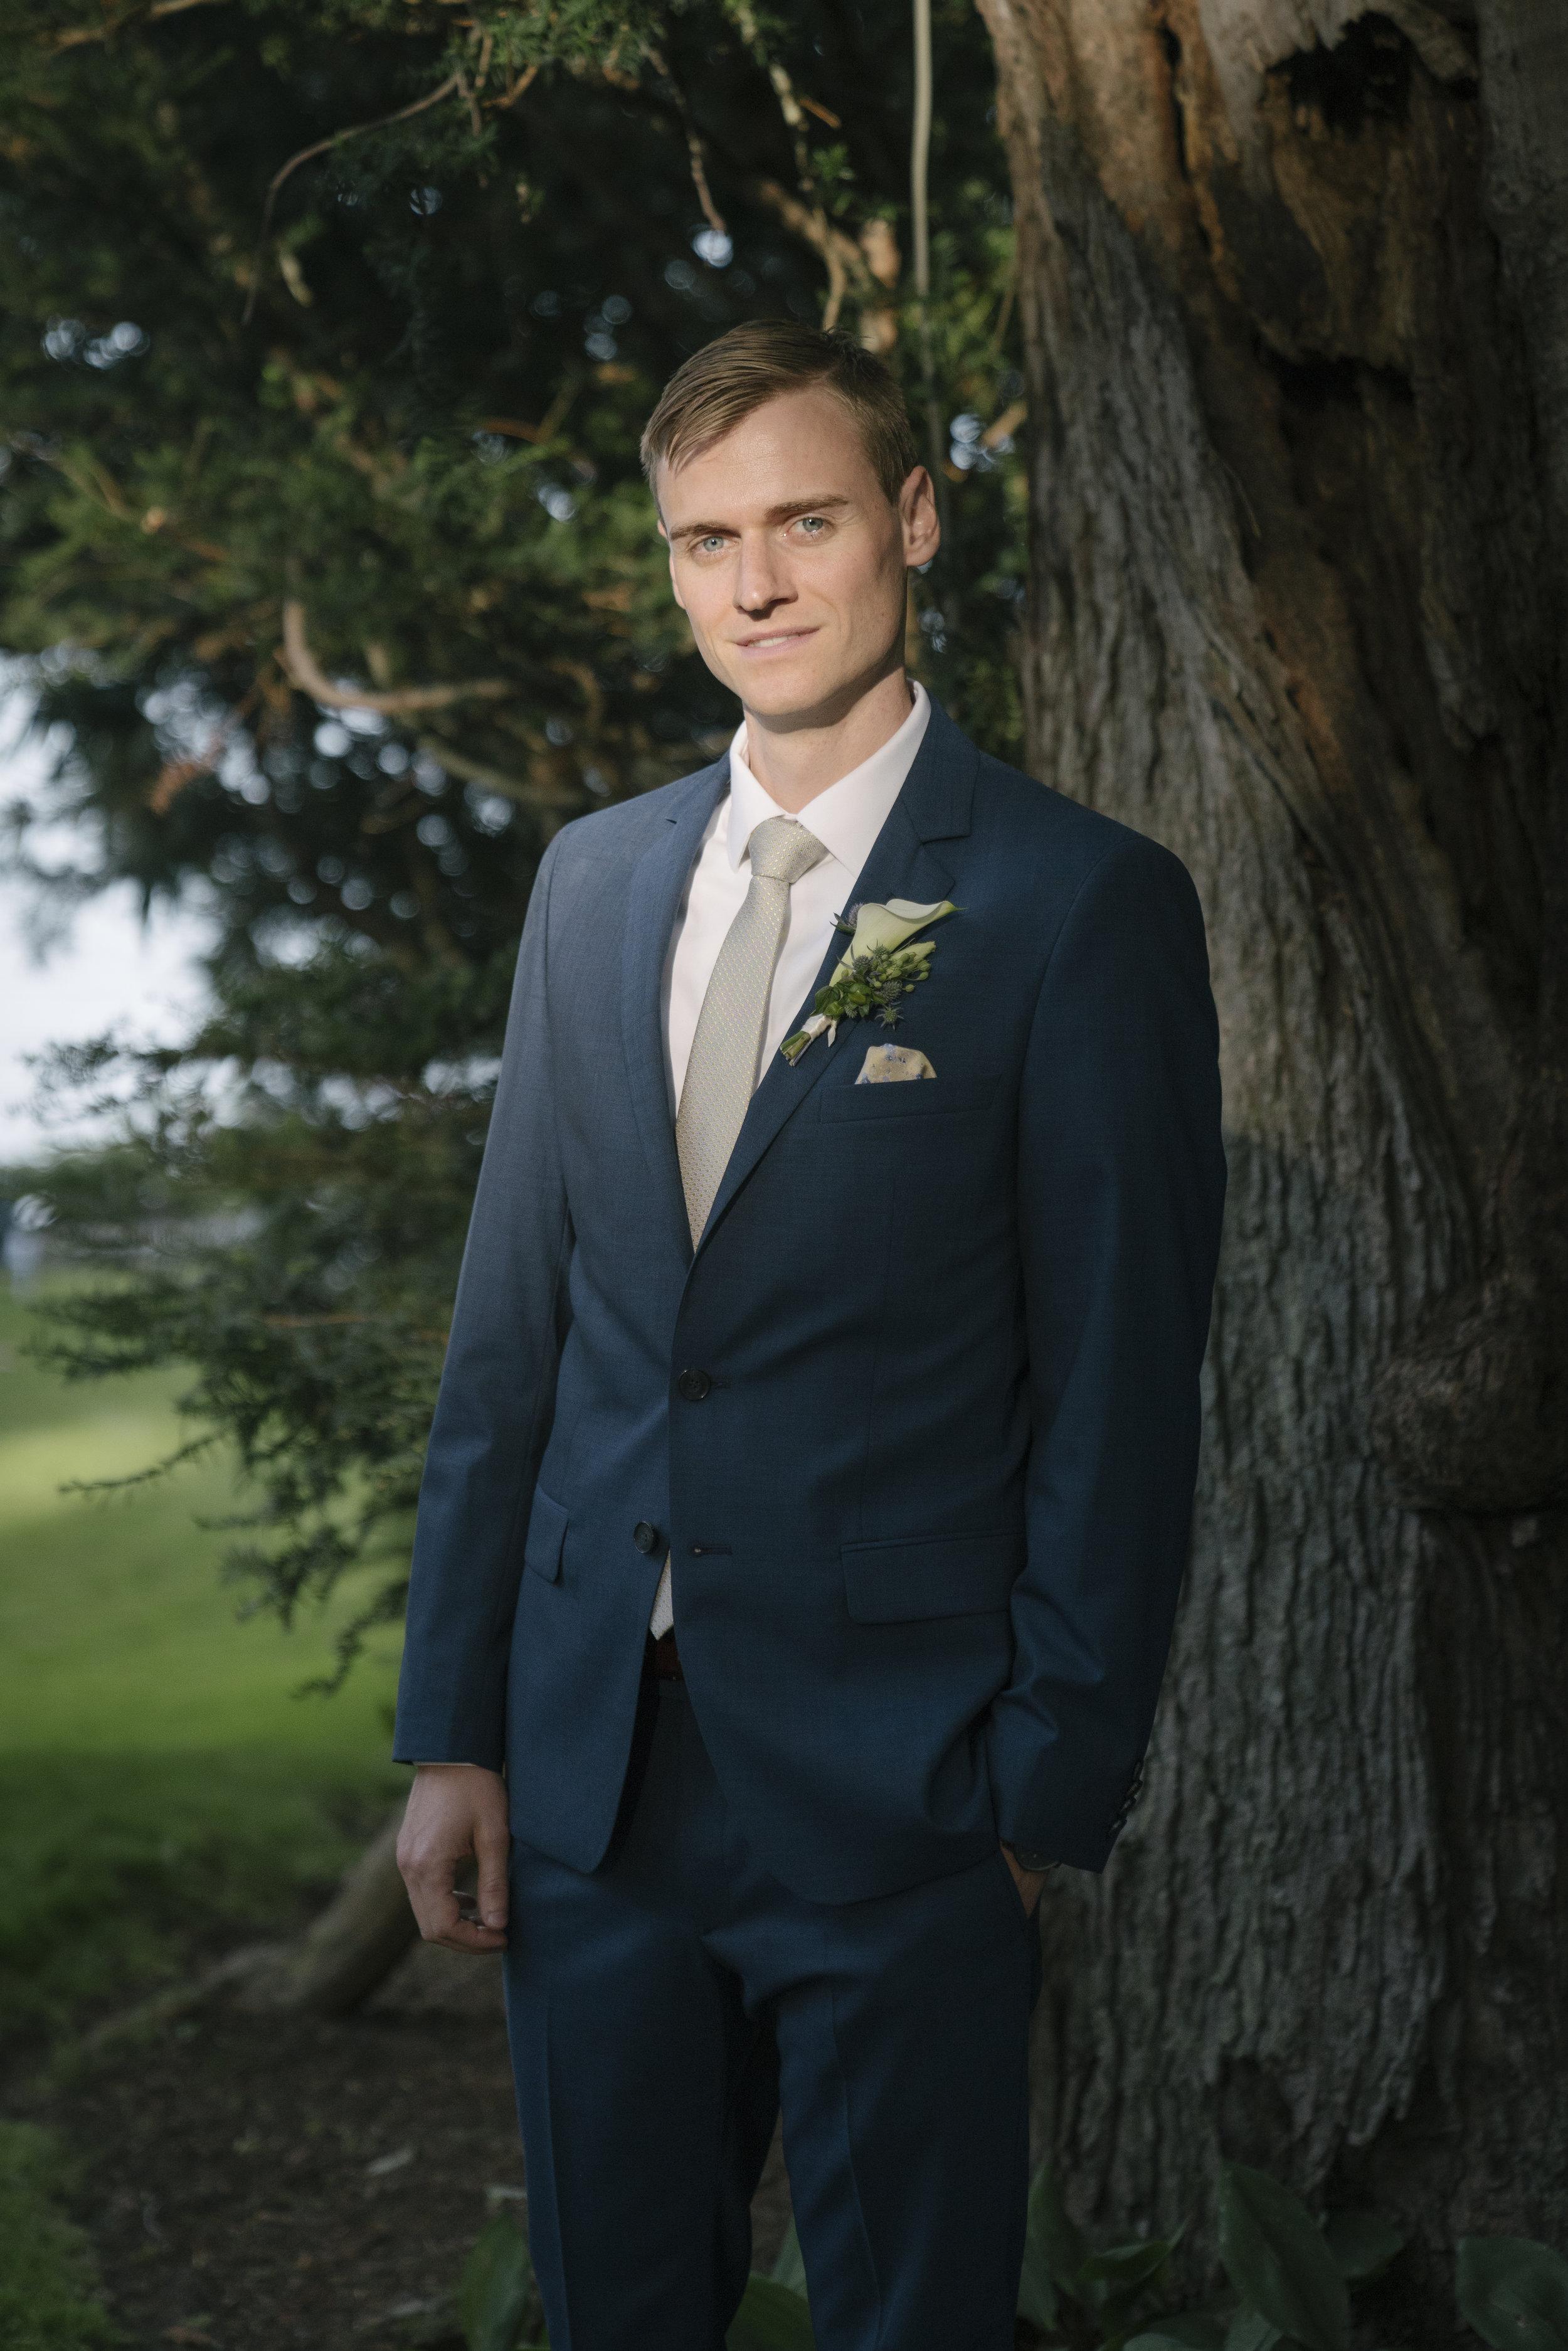 Wedding_LuisaDaniel_Master_JPGs (211 of 421).jpg